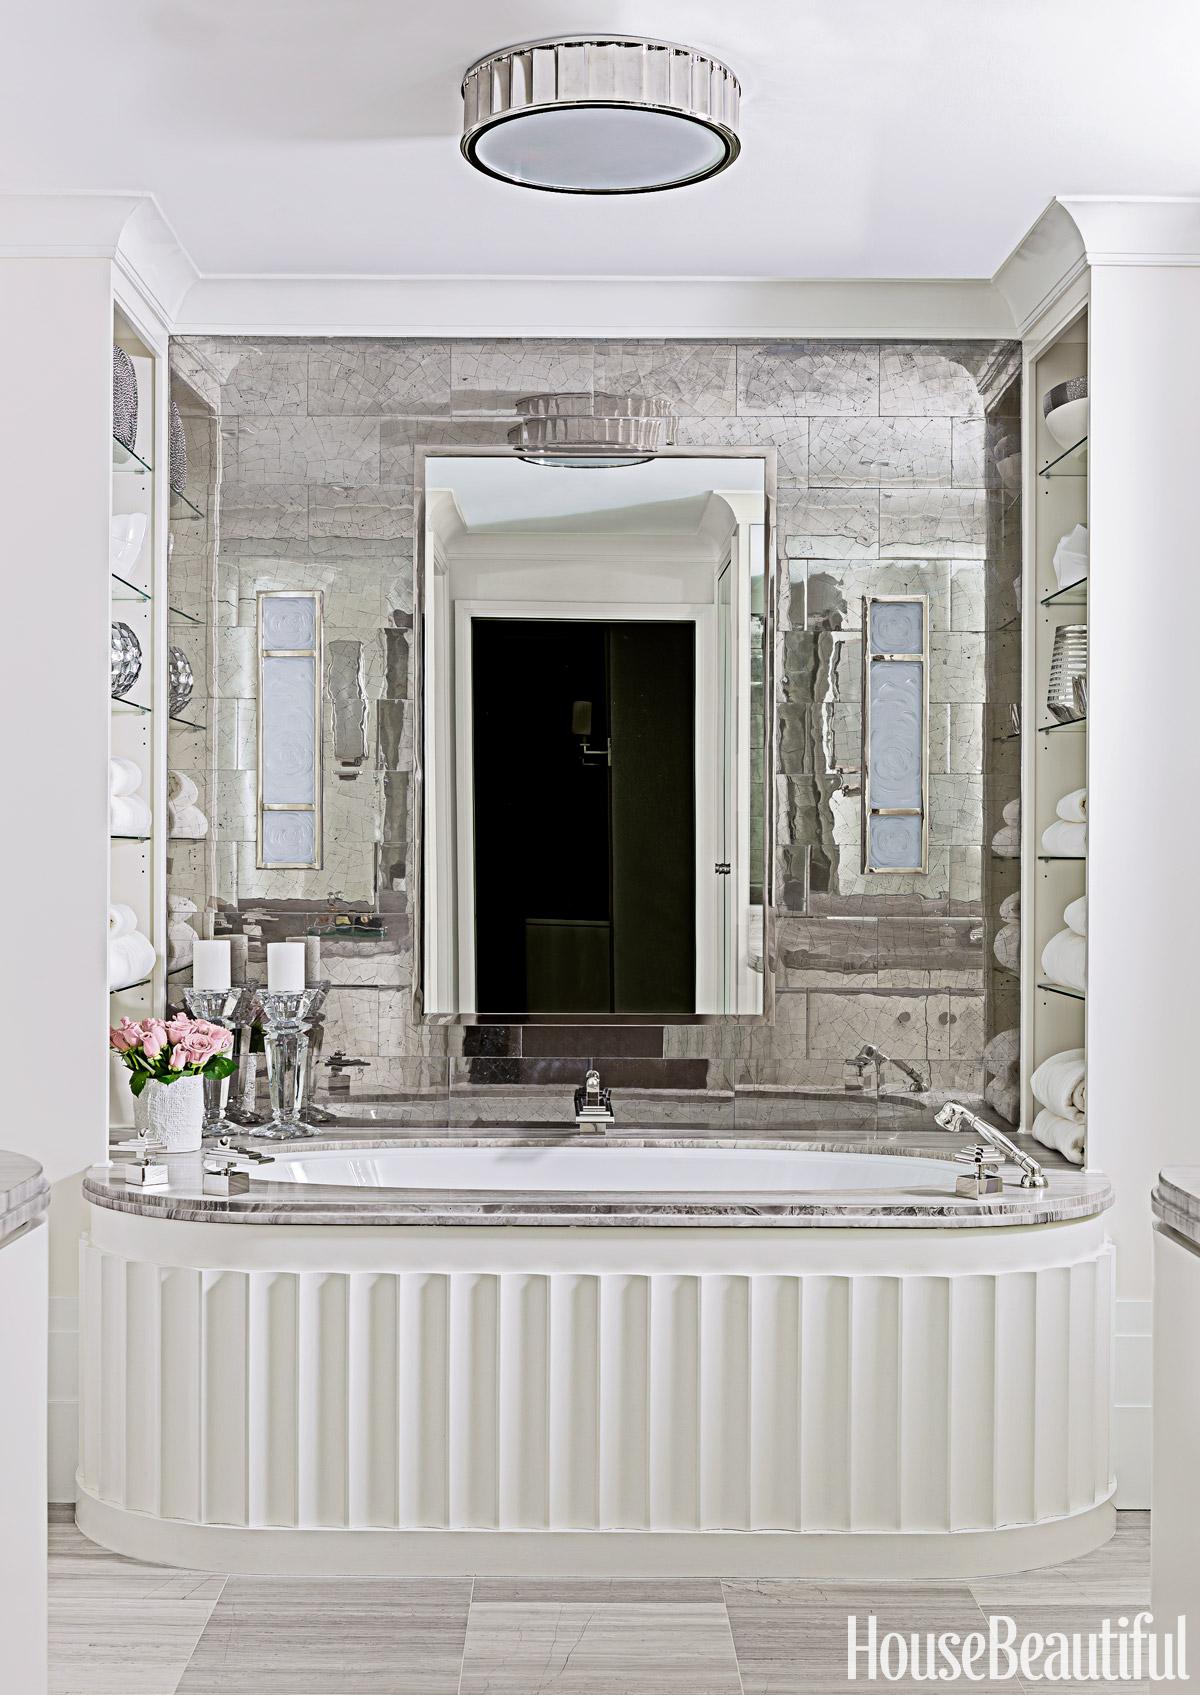 Ocean Liner Inspired Bathroom